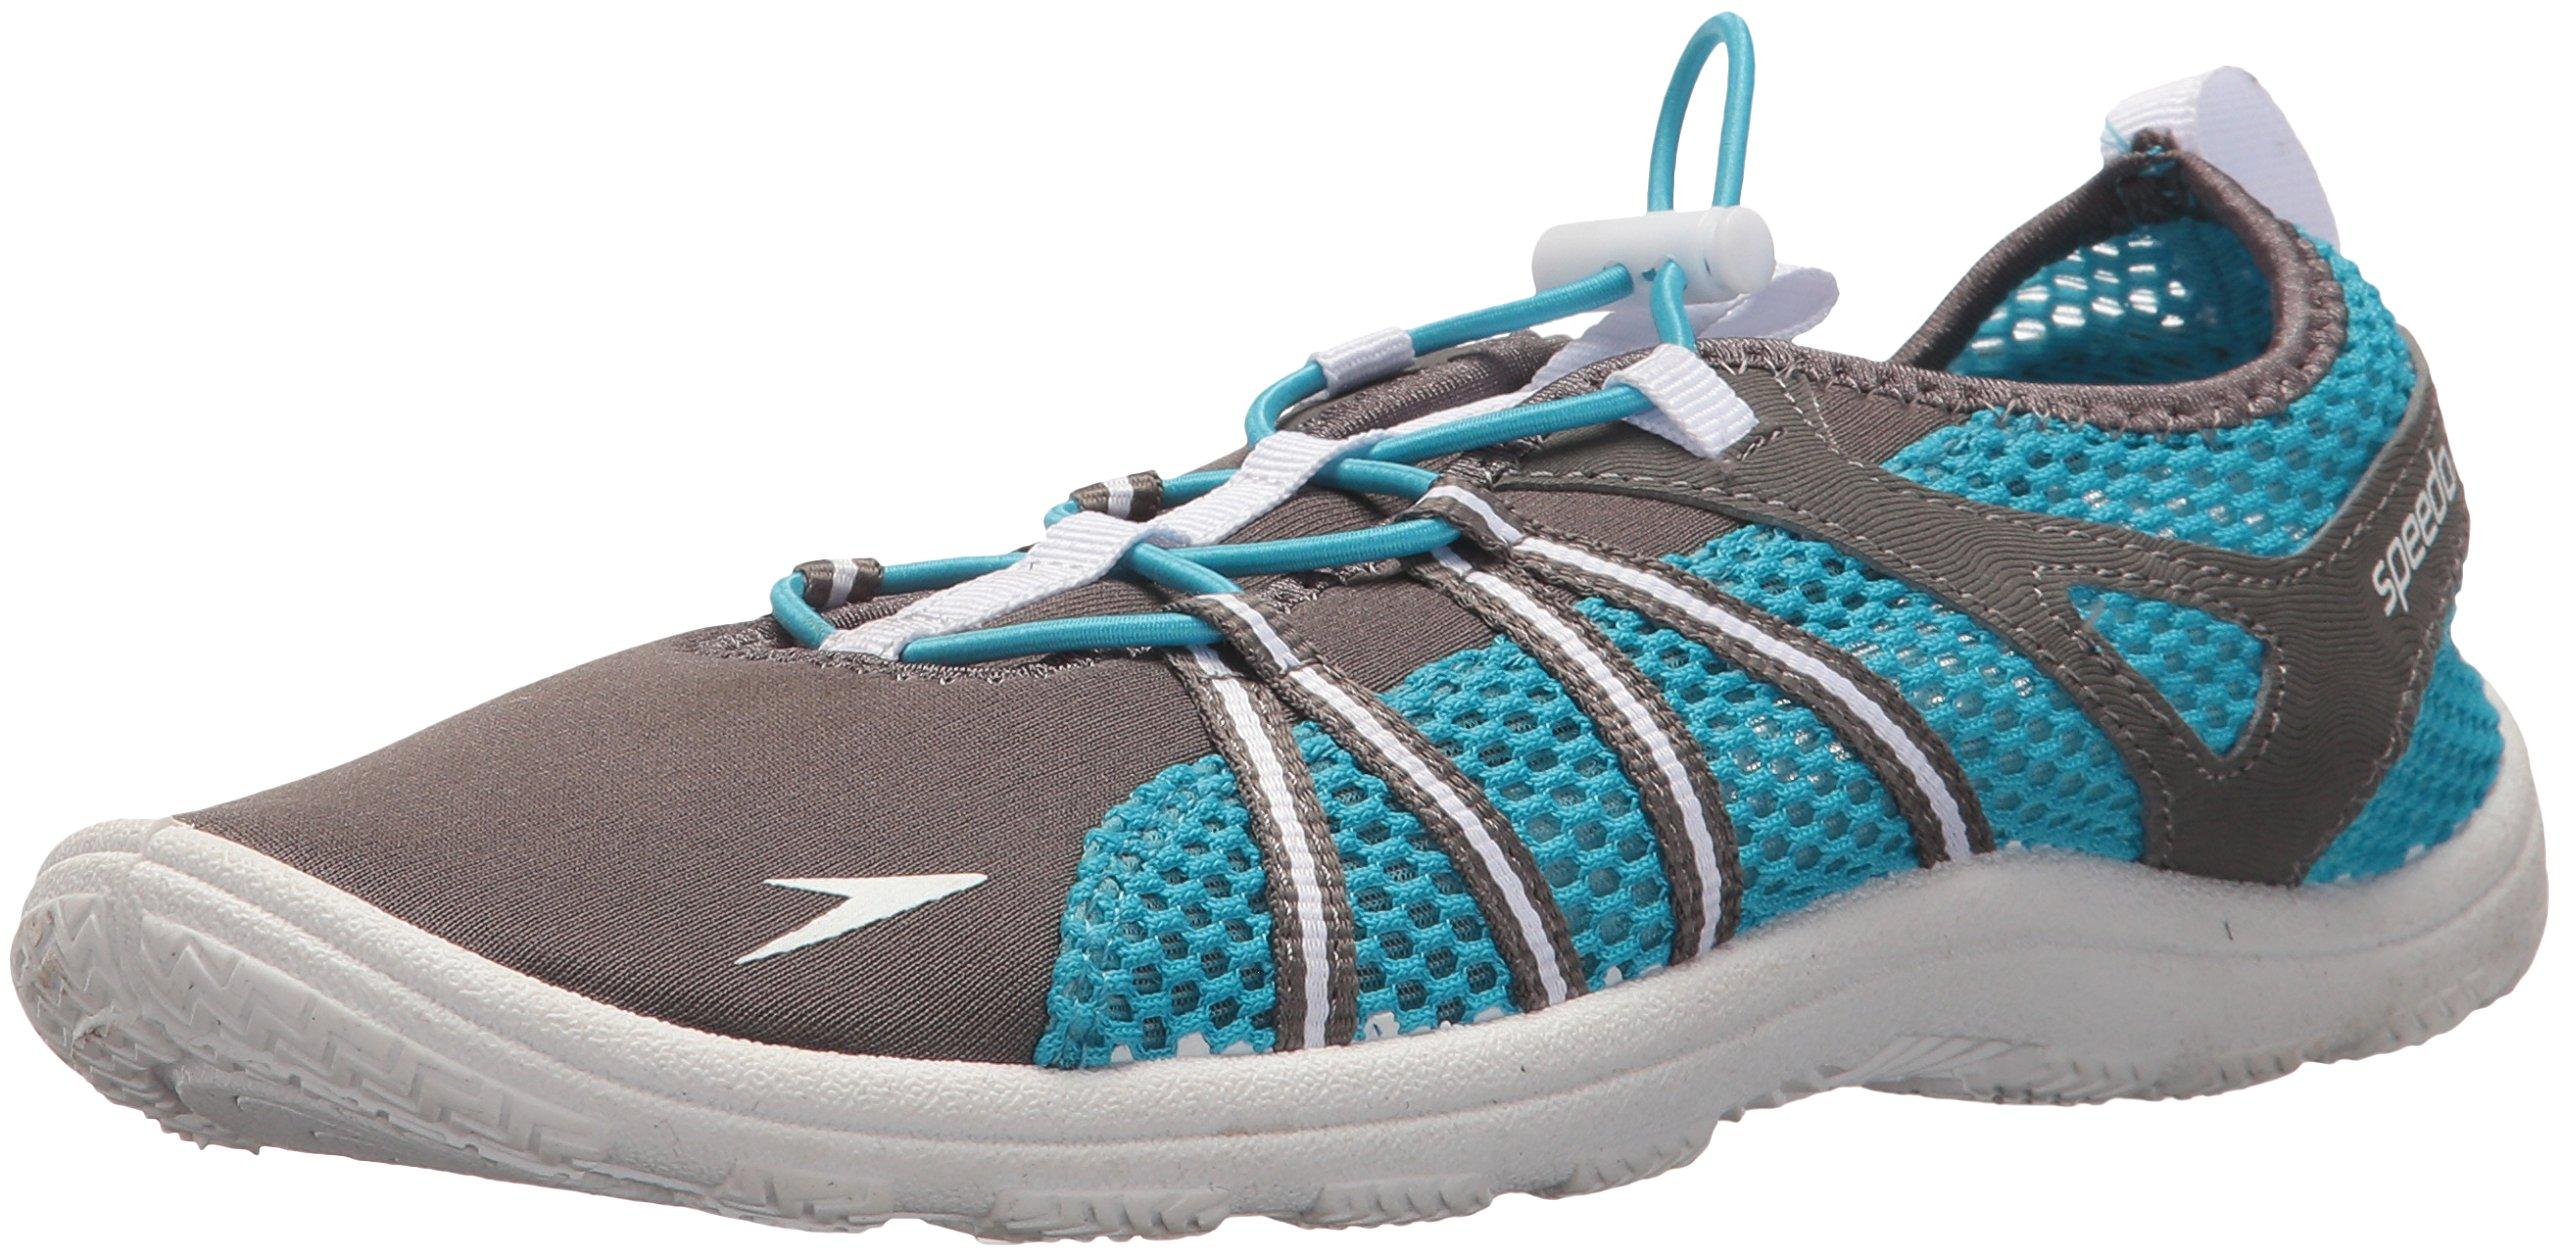 Speedo Women's Seaside Lace Water Shoe, Dark Gull Grey/White, 7 C/D US